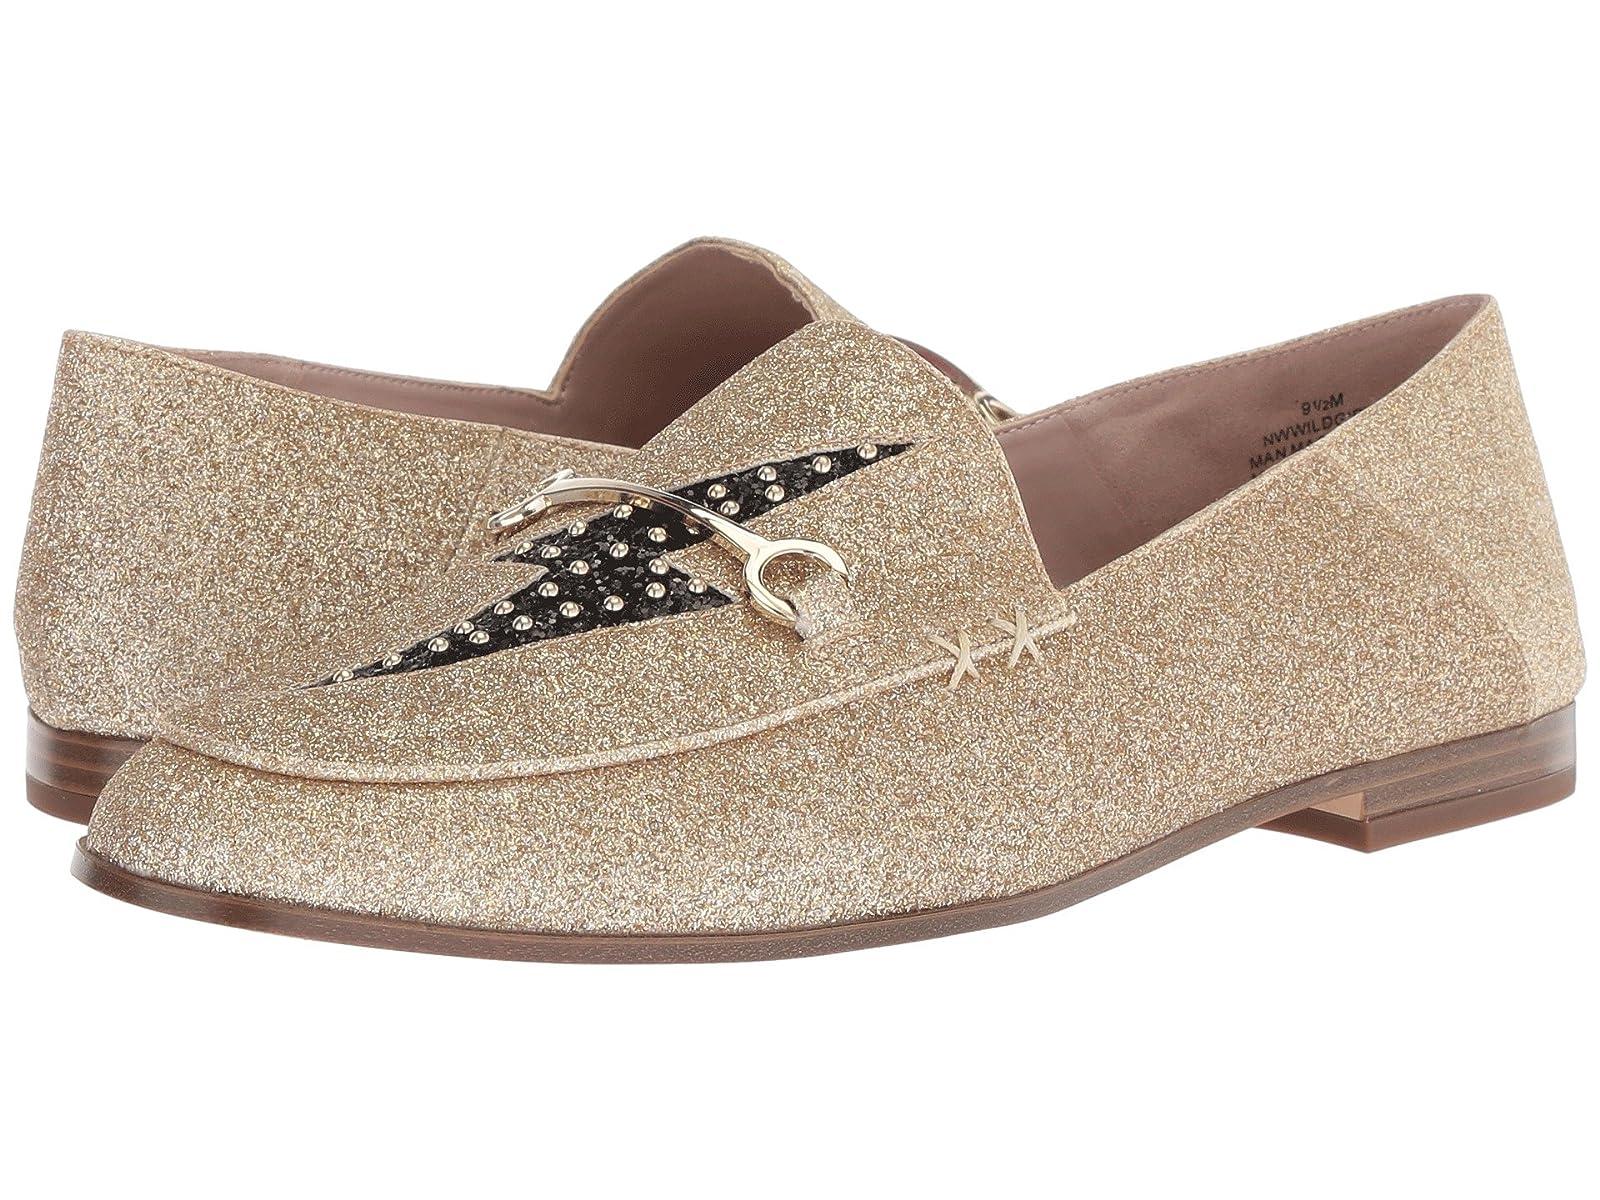 Nine West Wild Girls LoaferCheap and distinctive eye-catching shoes